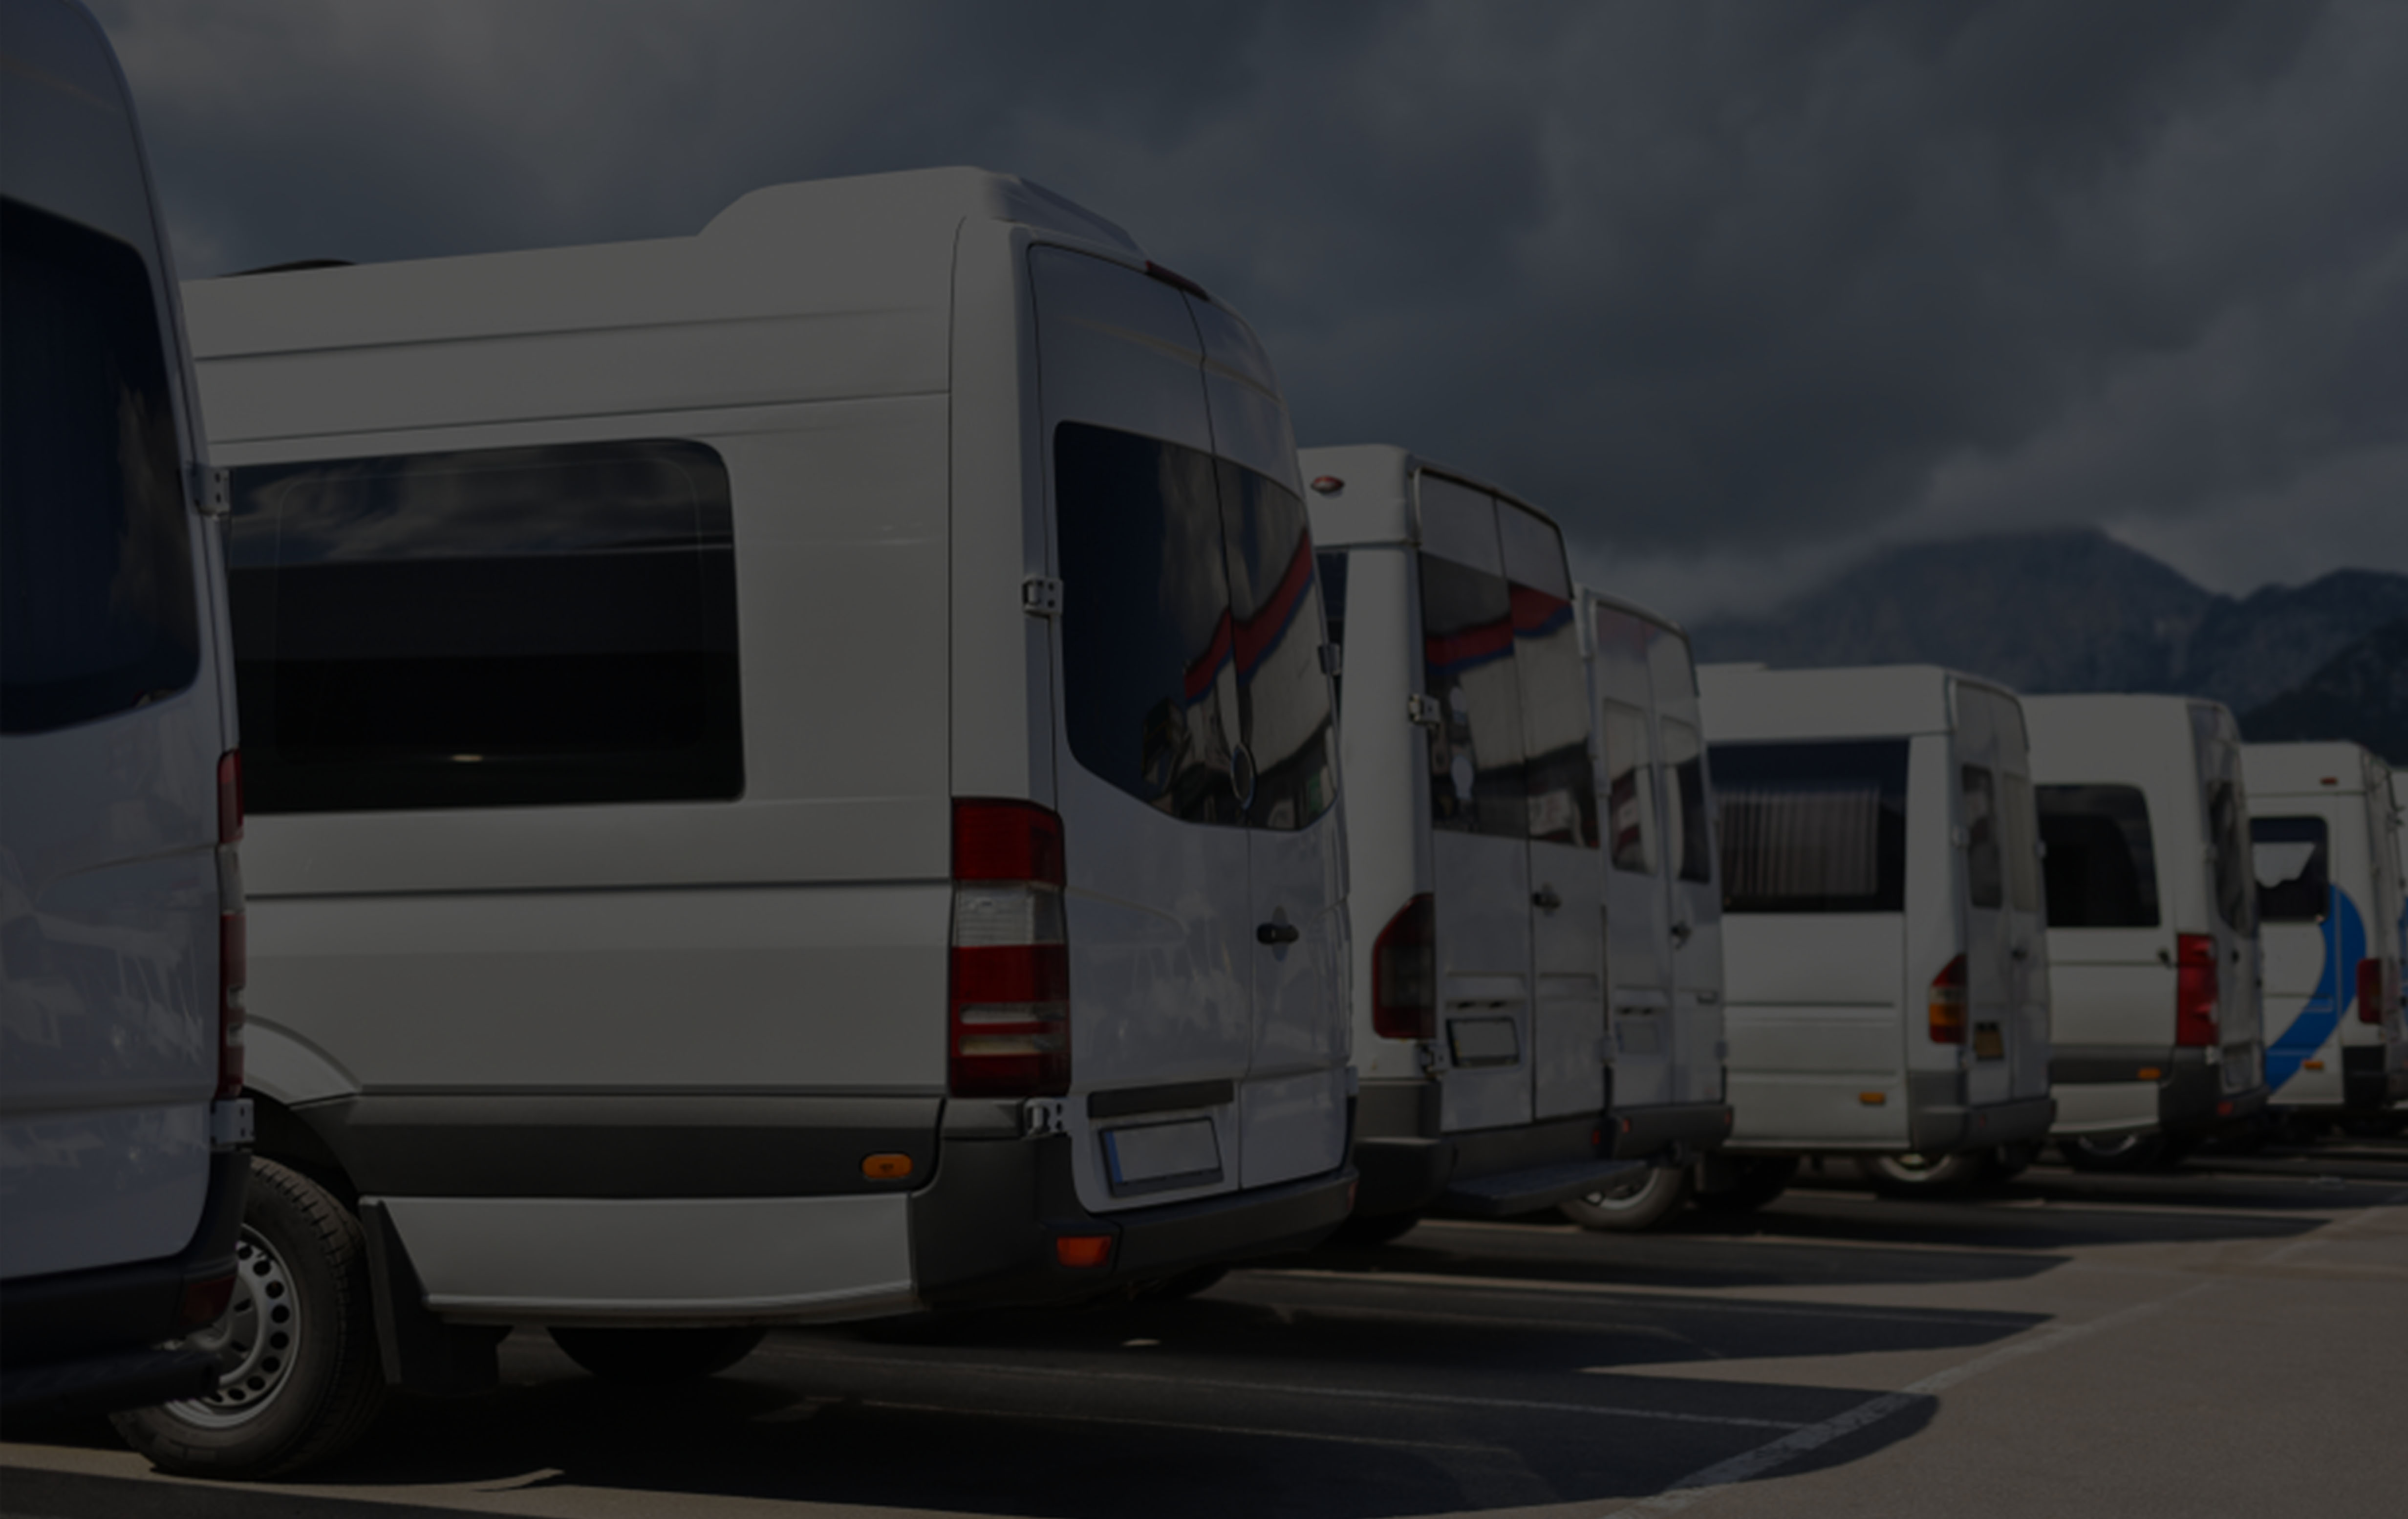 Fast Sprinter Van Repair in Dallas Ft  Worth | Fix My Sprinter | The